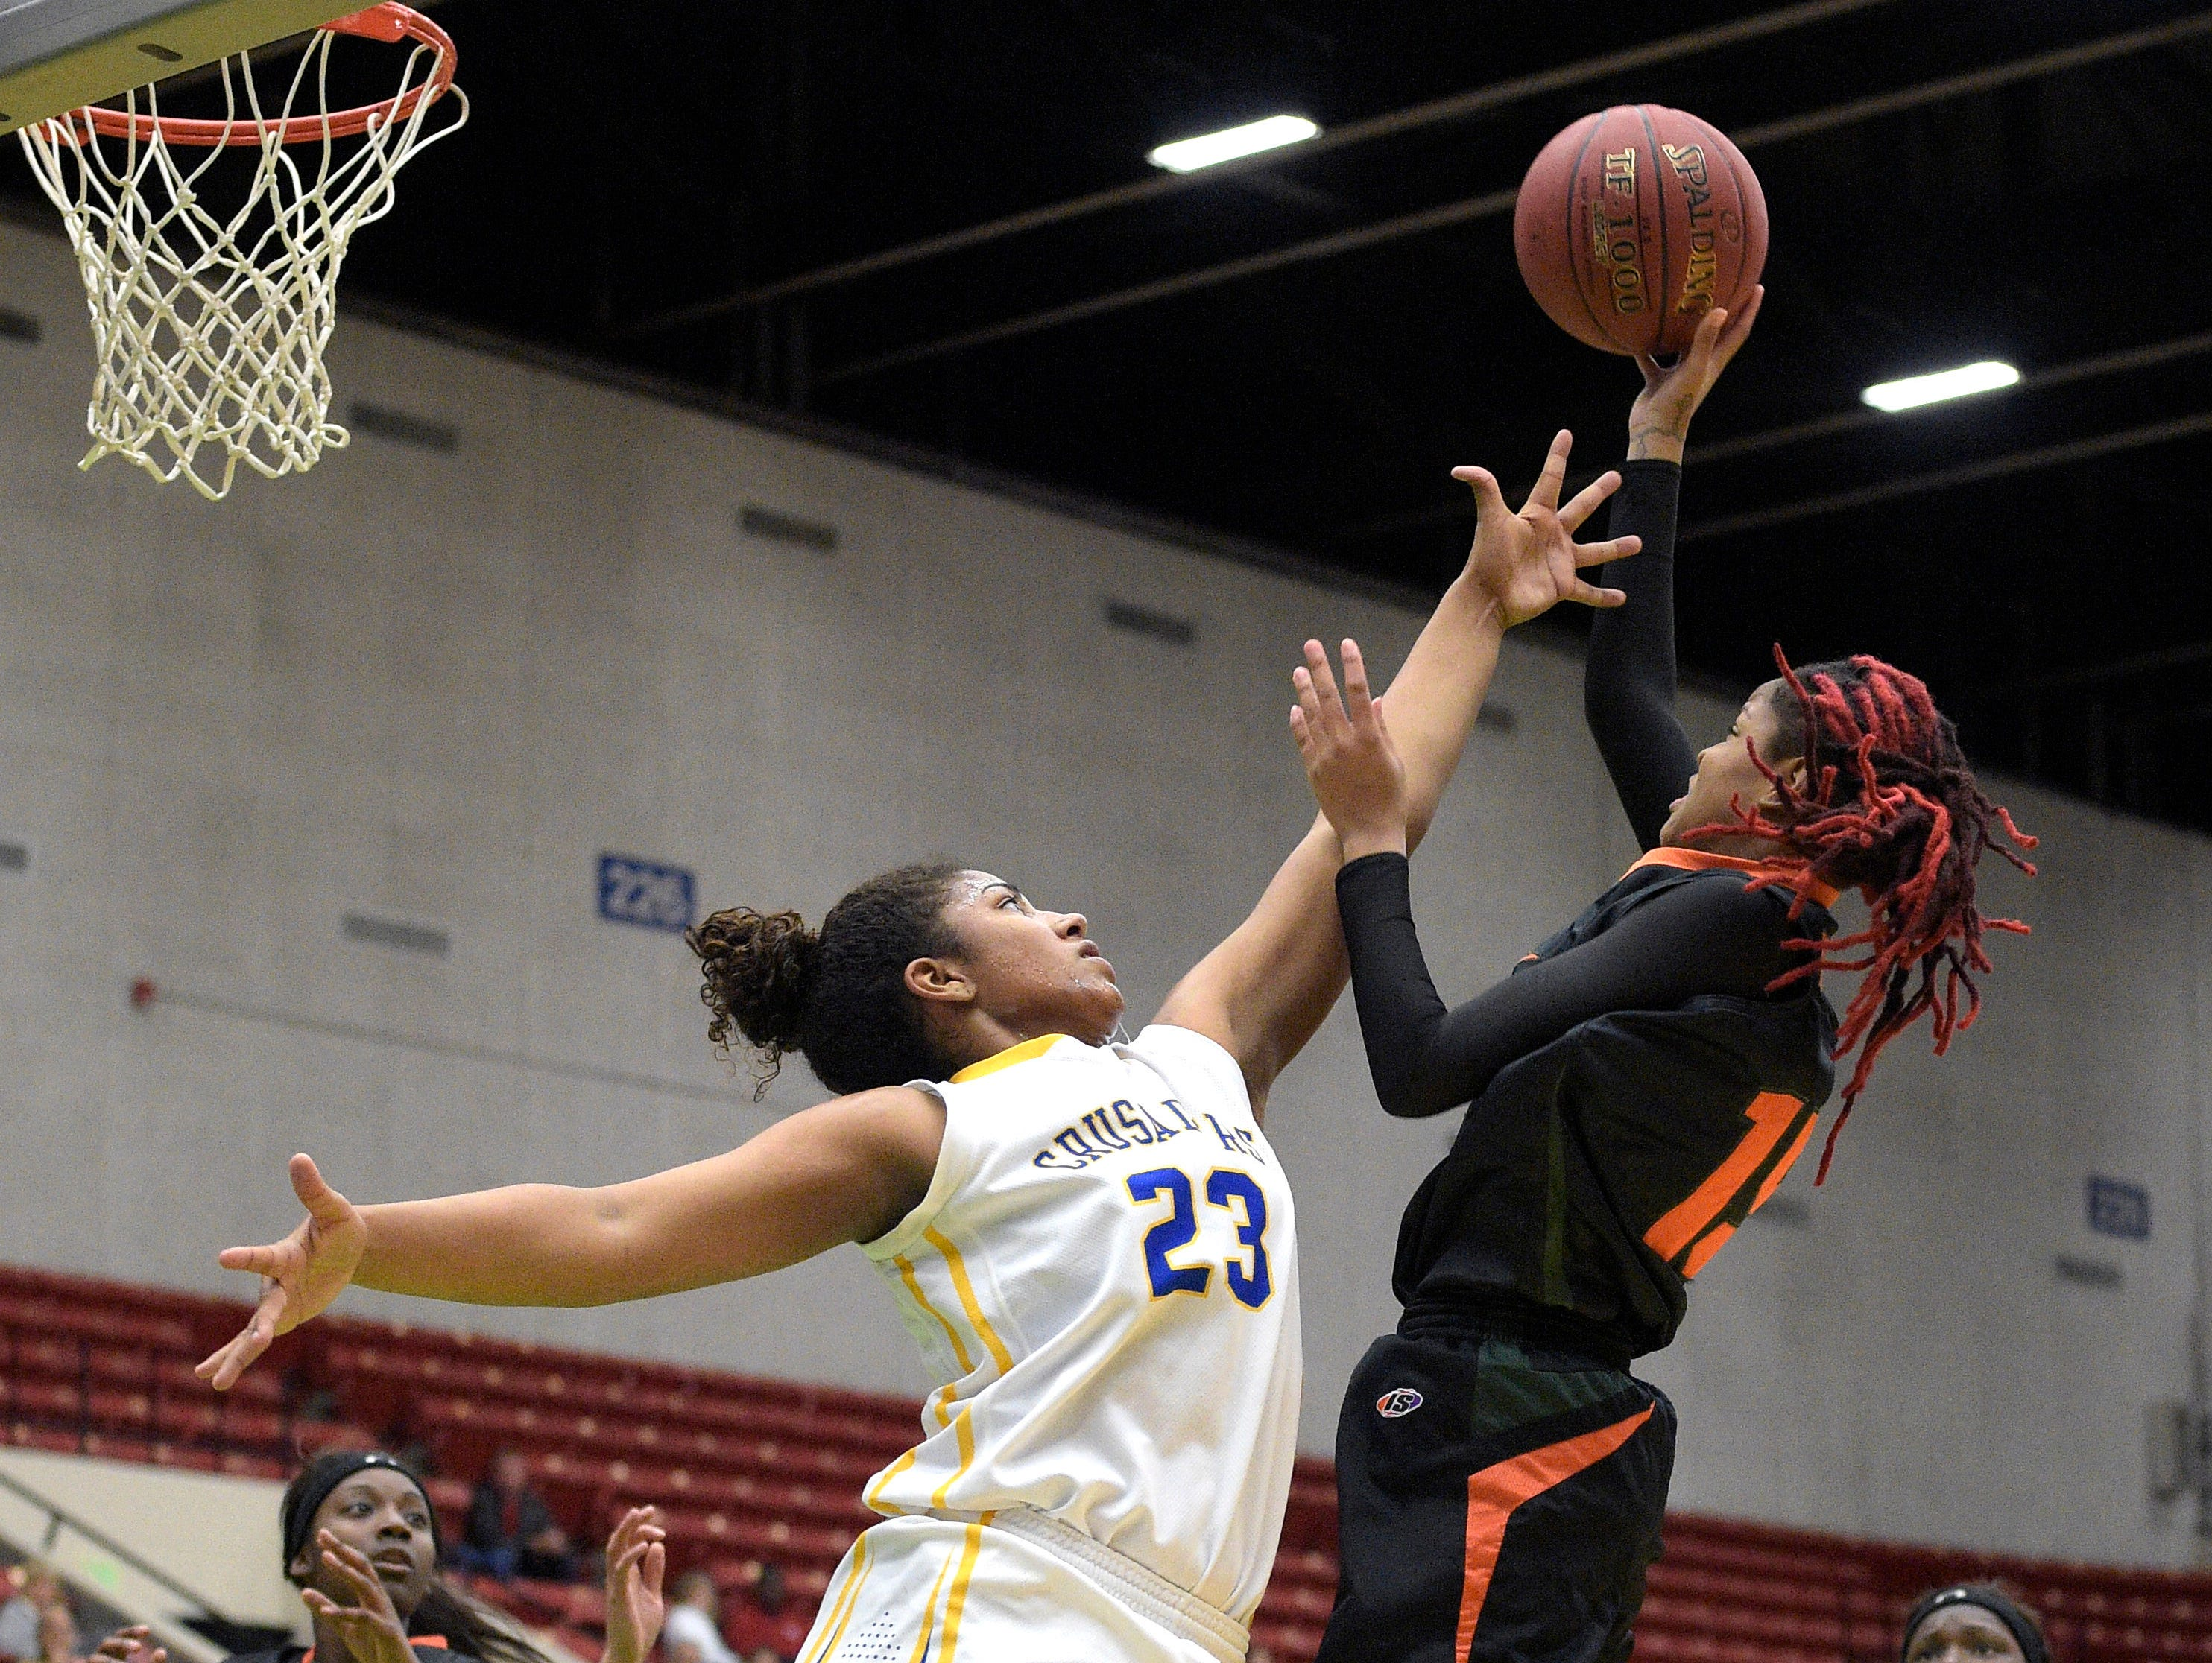 Dunbar's Dekeriya Patterson (15) puts up a shot in front of Cardinal Newman's Milan Morris (23) during a girls basketball game at the FHSAA State Finals, Tuesday, Feb. 17, 2015, in Lakeland, Fla.(Photo/Phelan M. Ebenhack)